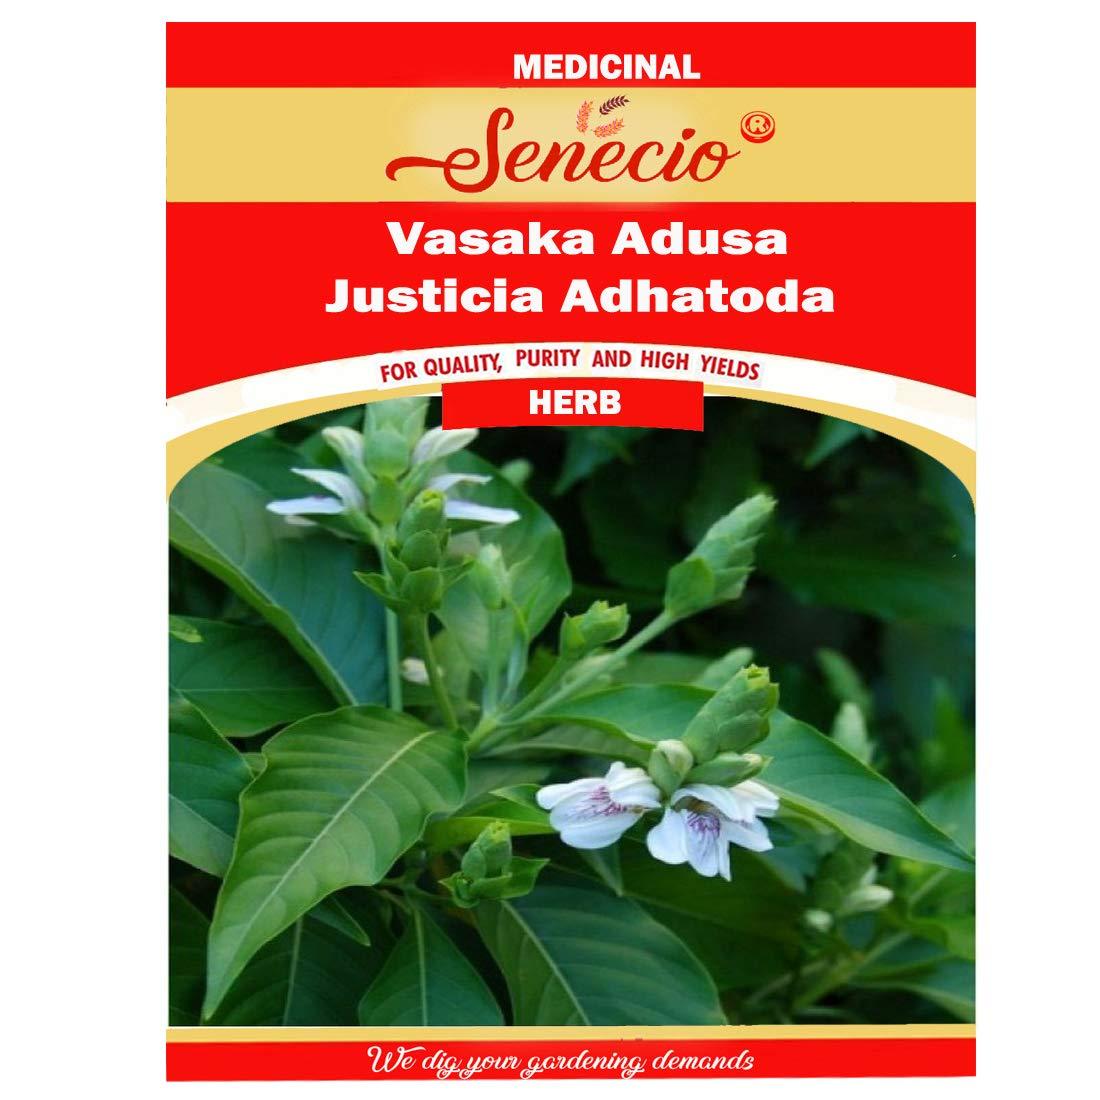 SENECIO® Vasaka, Adusa, Justicia Adhatoda, Ardusi-Malabar Nut